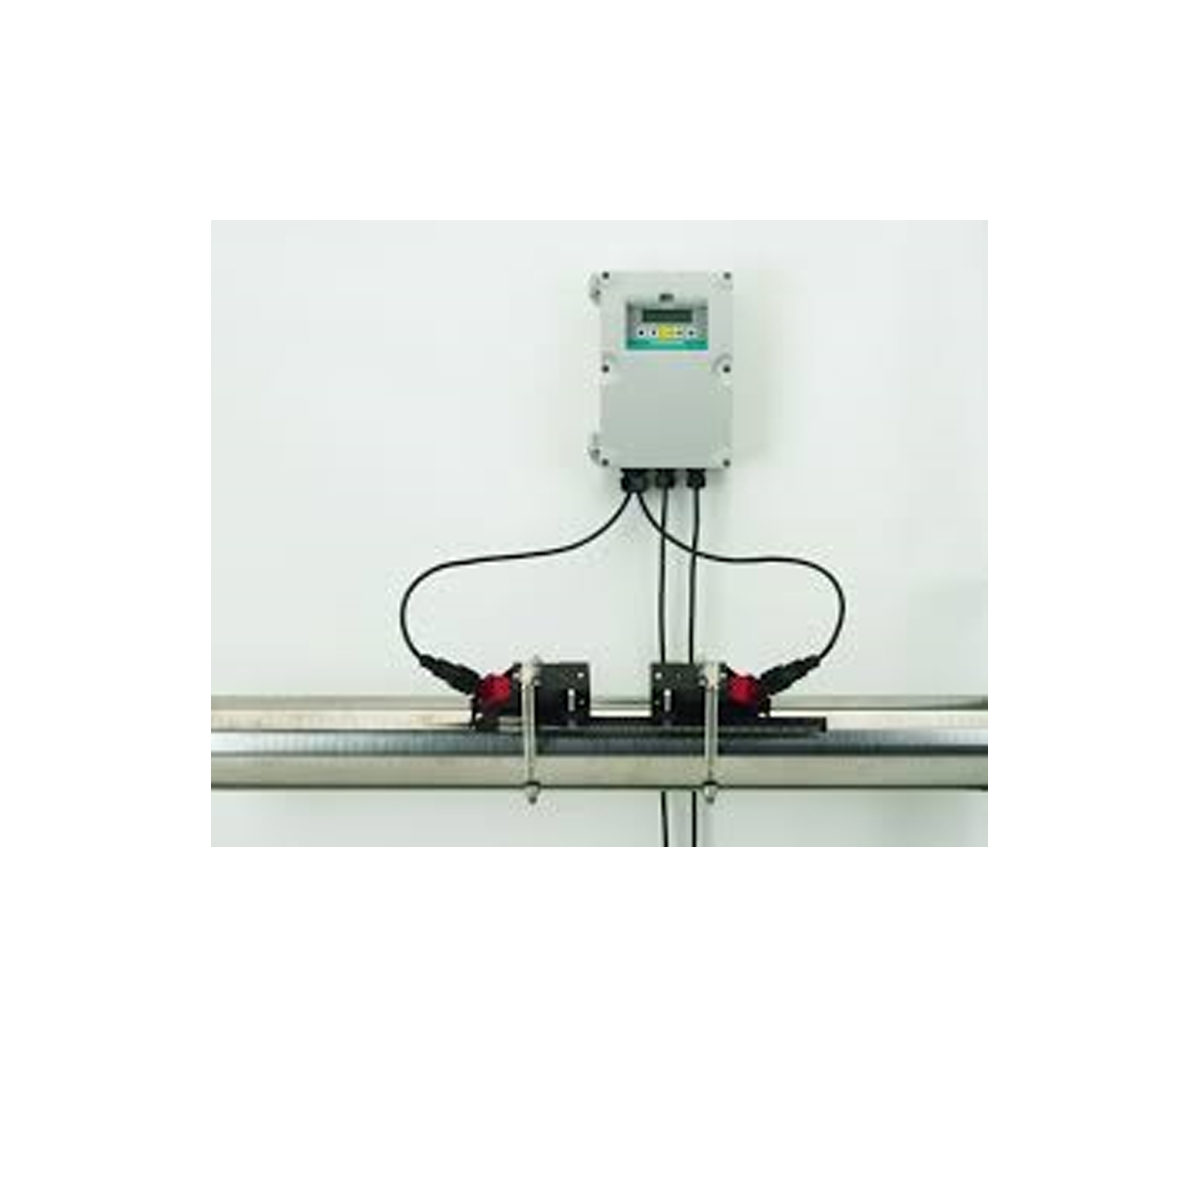 SIEMENS SITRANS FST 020 (FIXED TYPE) มิเตอร์วัดการไหลแบบ Ultrasonic Clamp On